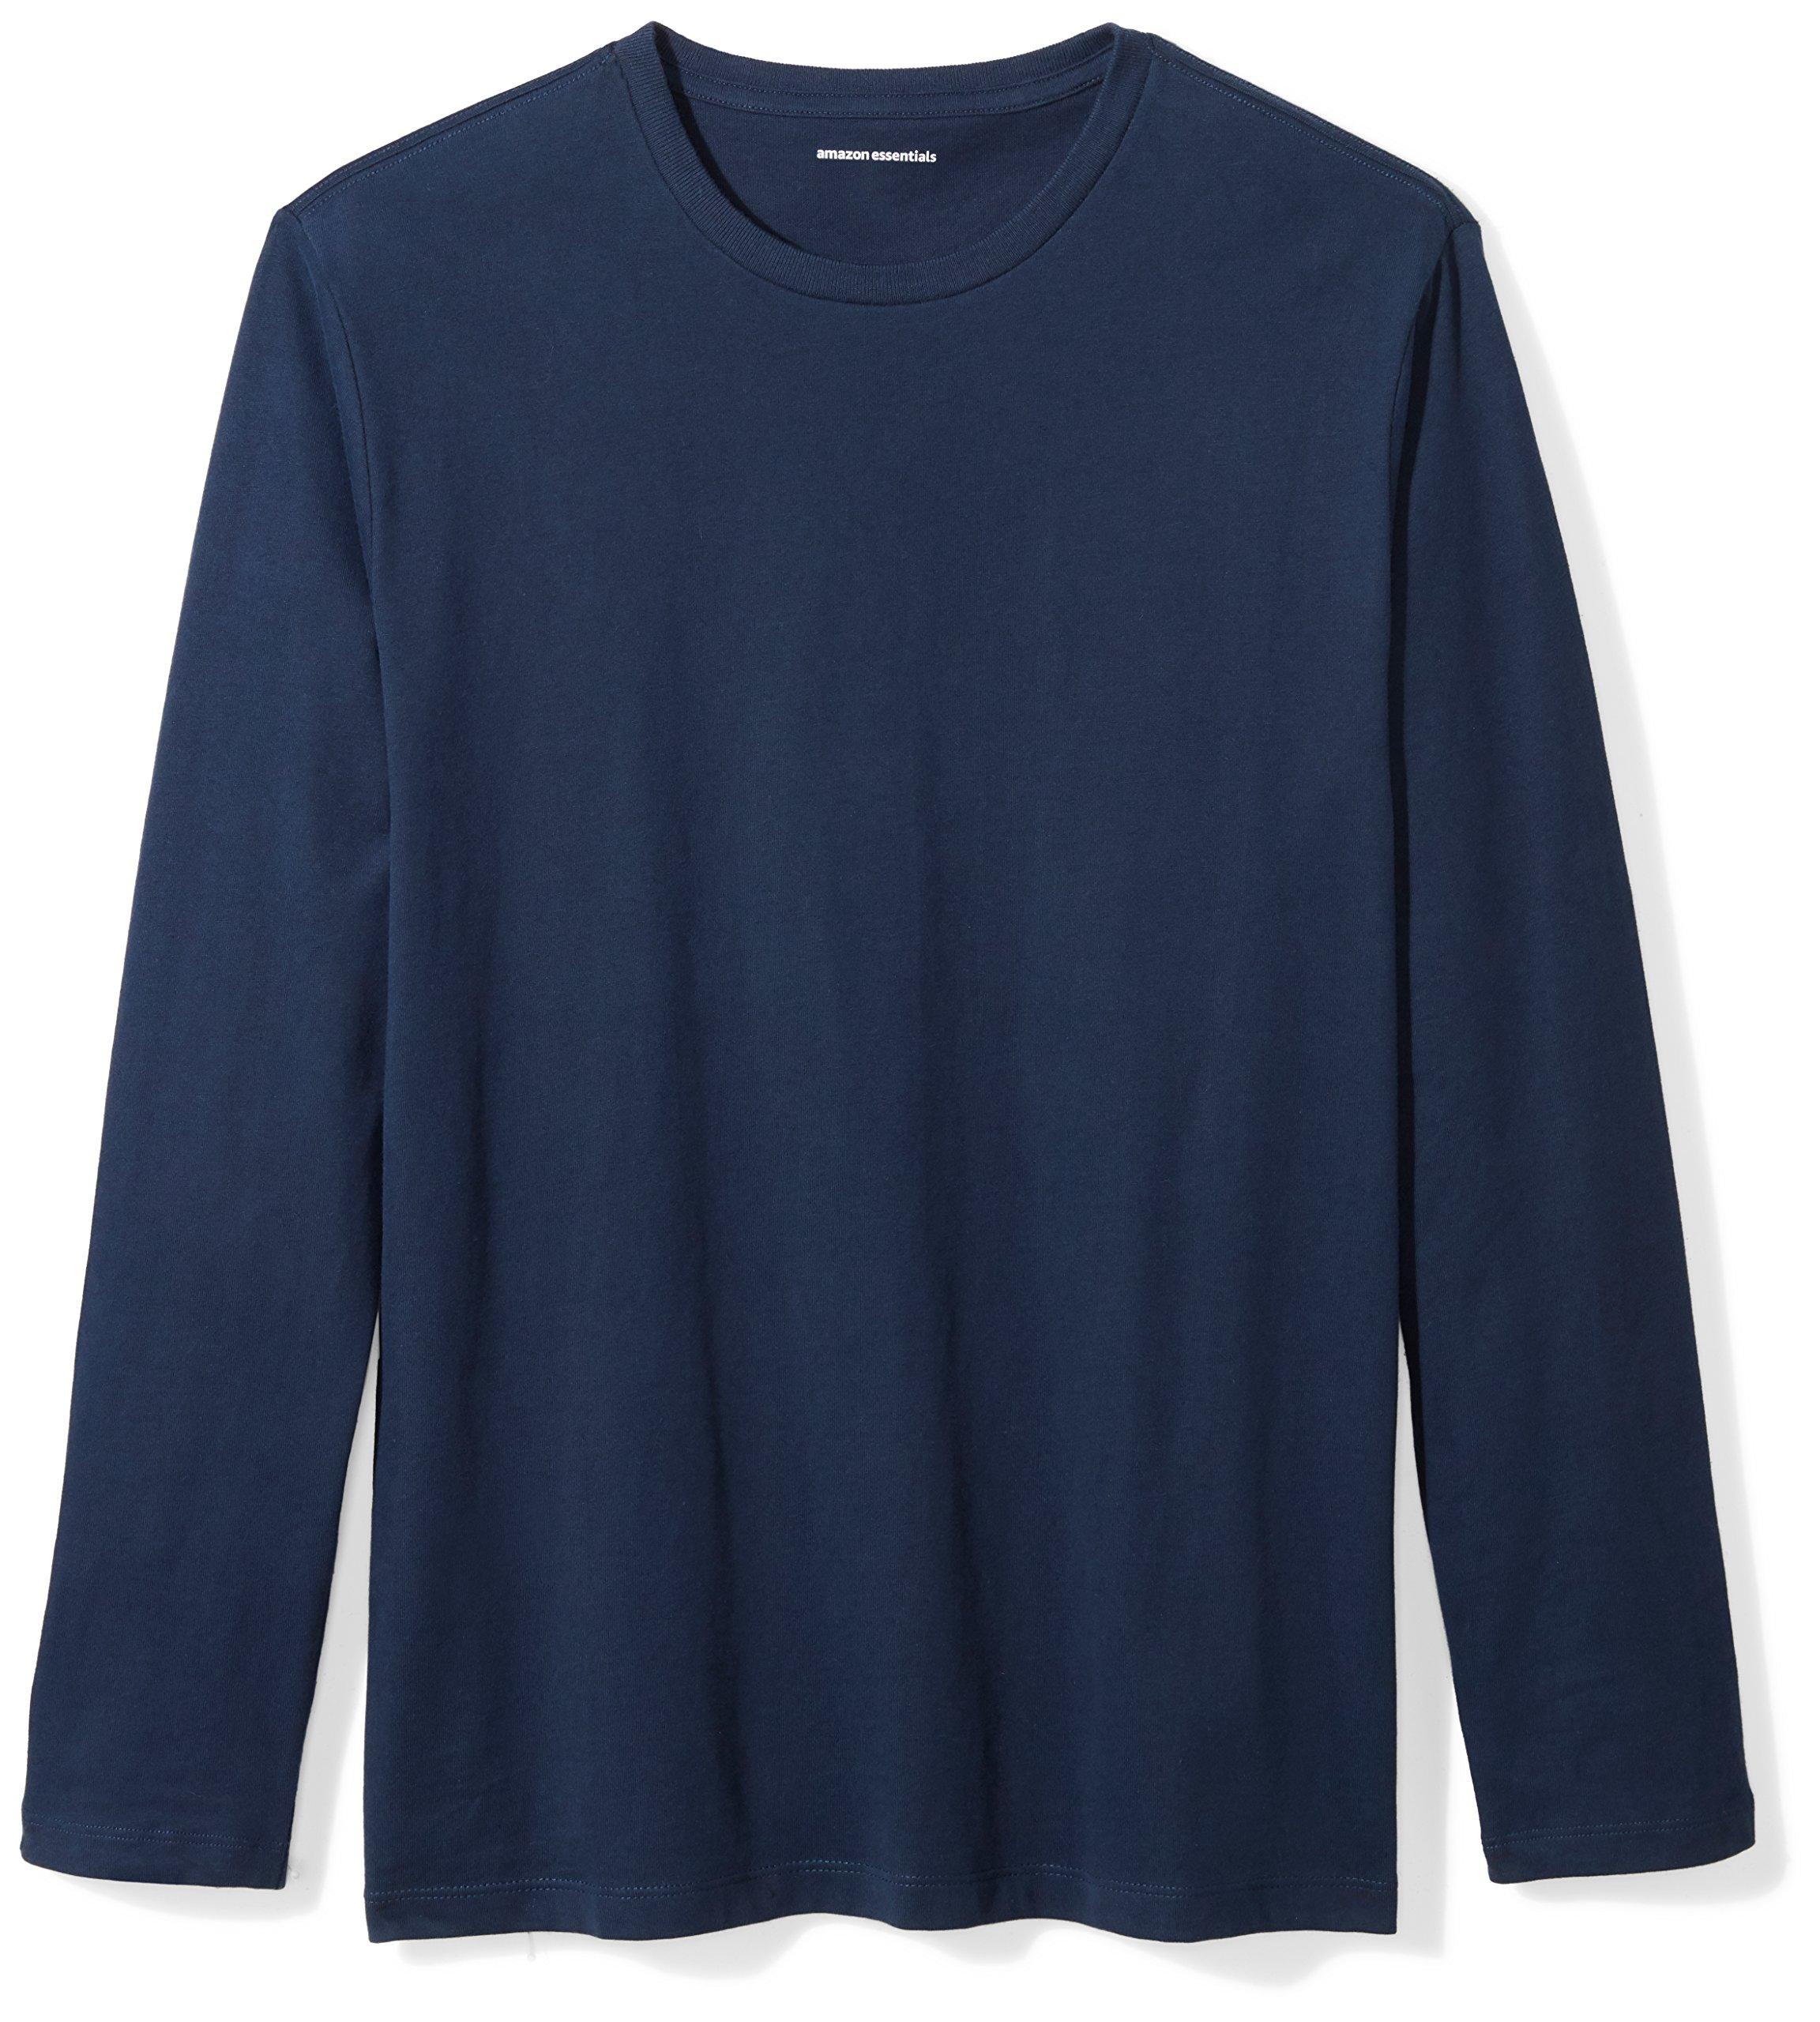 Amazon Essentials Men's Regular-Fit Long-Sleeve T-Shirt, Navy, Medium